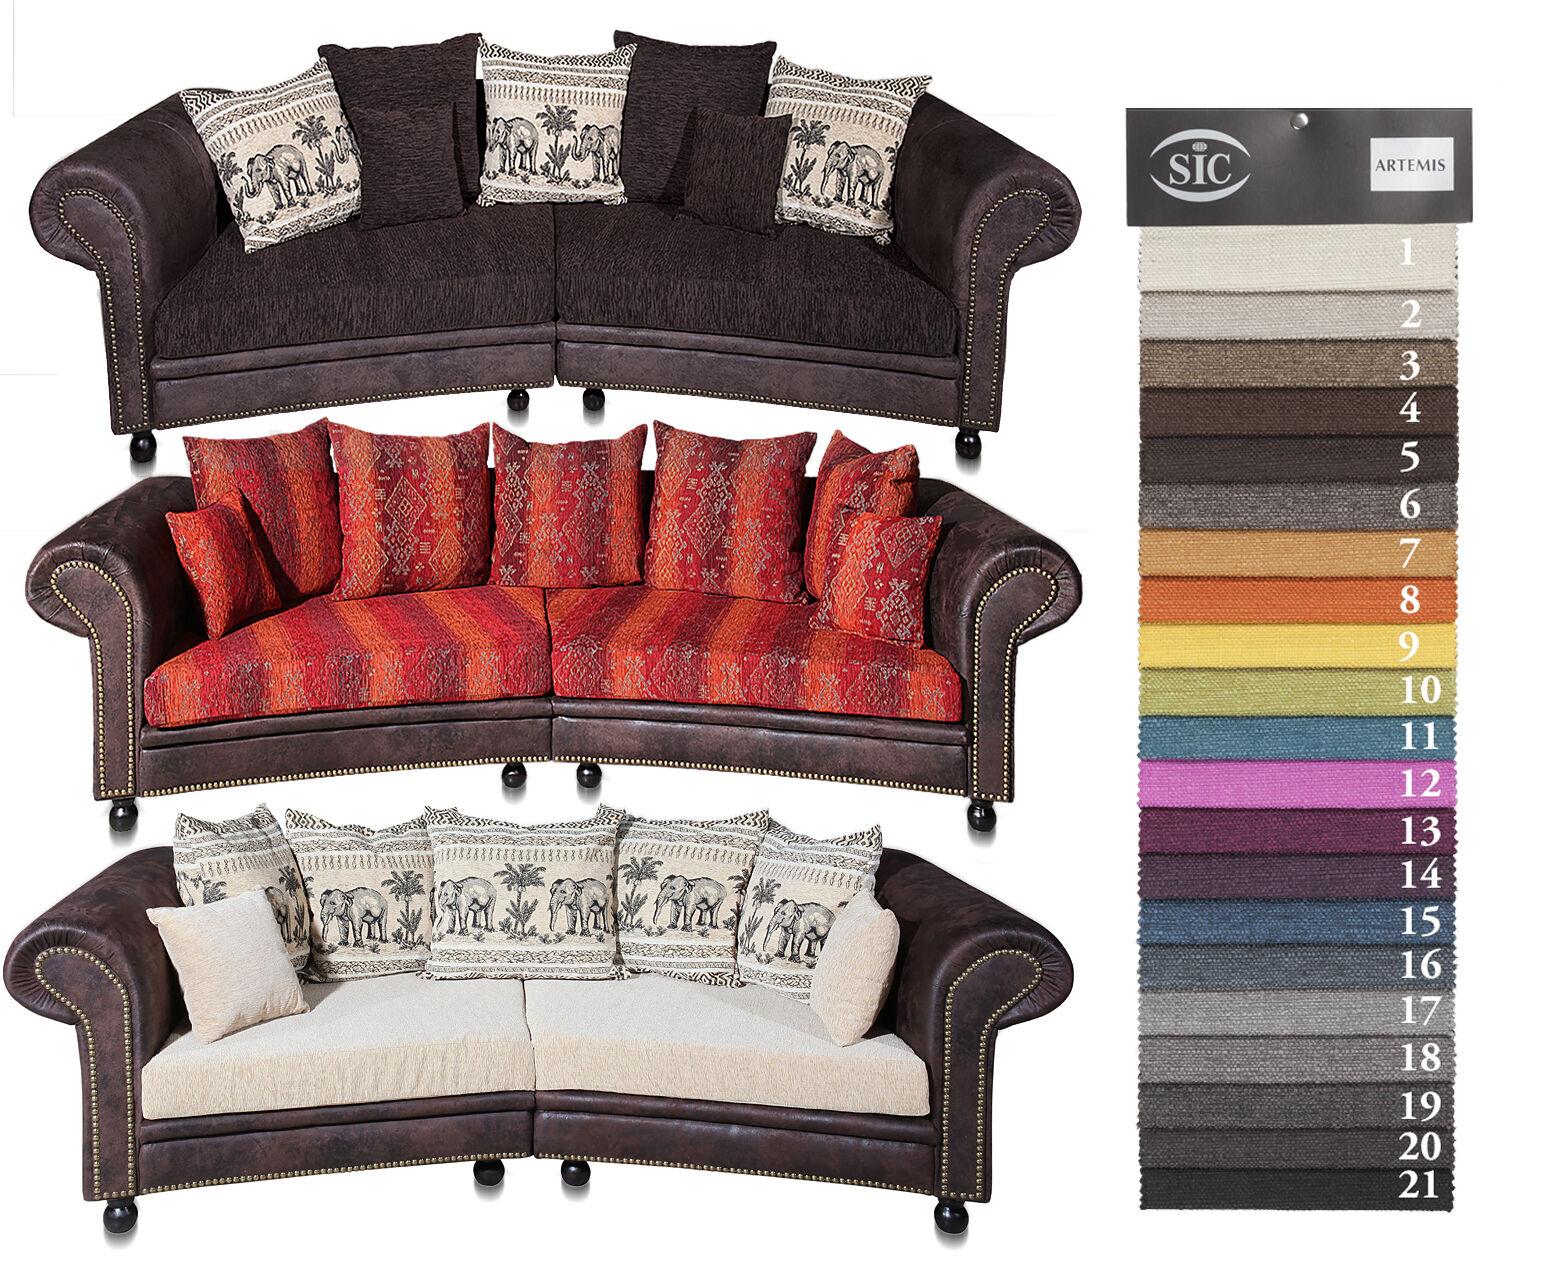 Big Sofa Sessel Couch Big Sofa Hawana 3 Mit Schlaffunktion